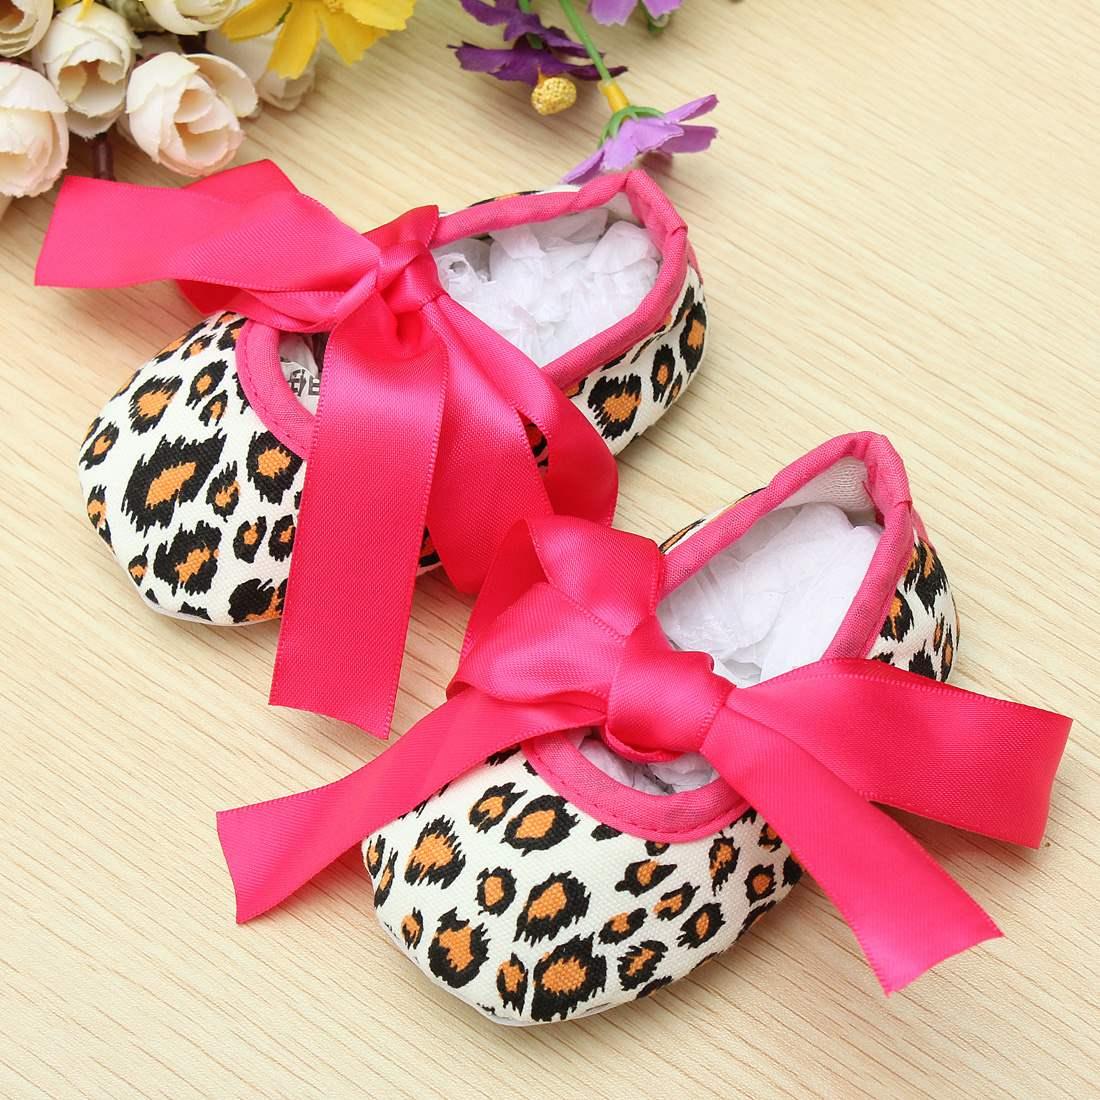 2015 New Spring Infant Baby First Walkers Dot Damask Zebra Leopard Print Silk Ribbon Newborn Girls Toddler prewalkers baby shoes(China (Mainland))